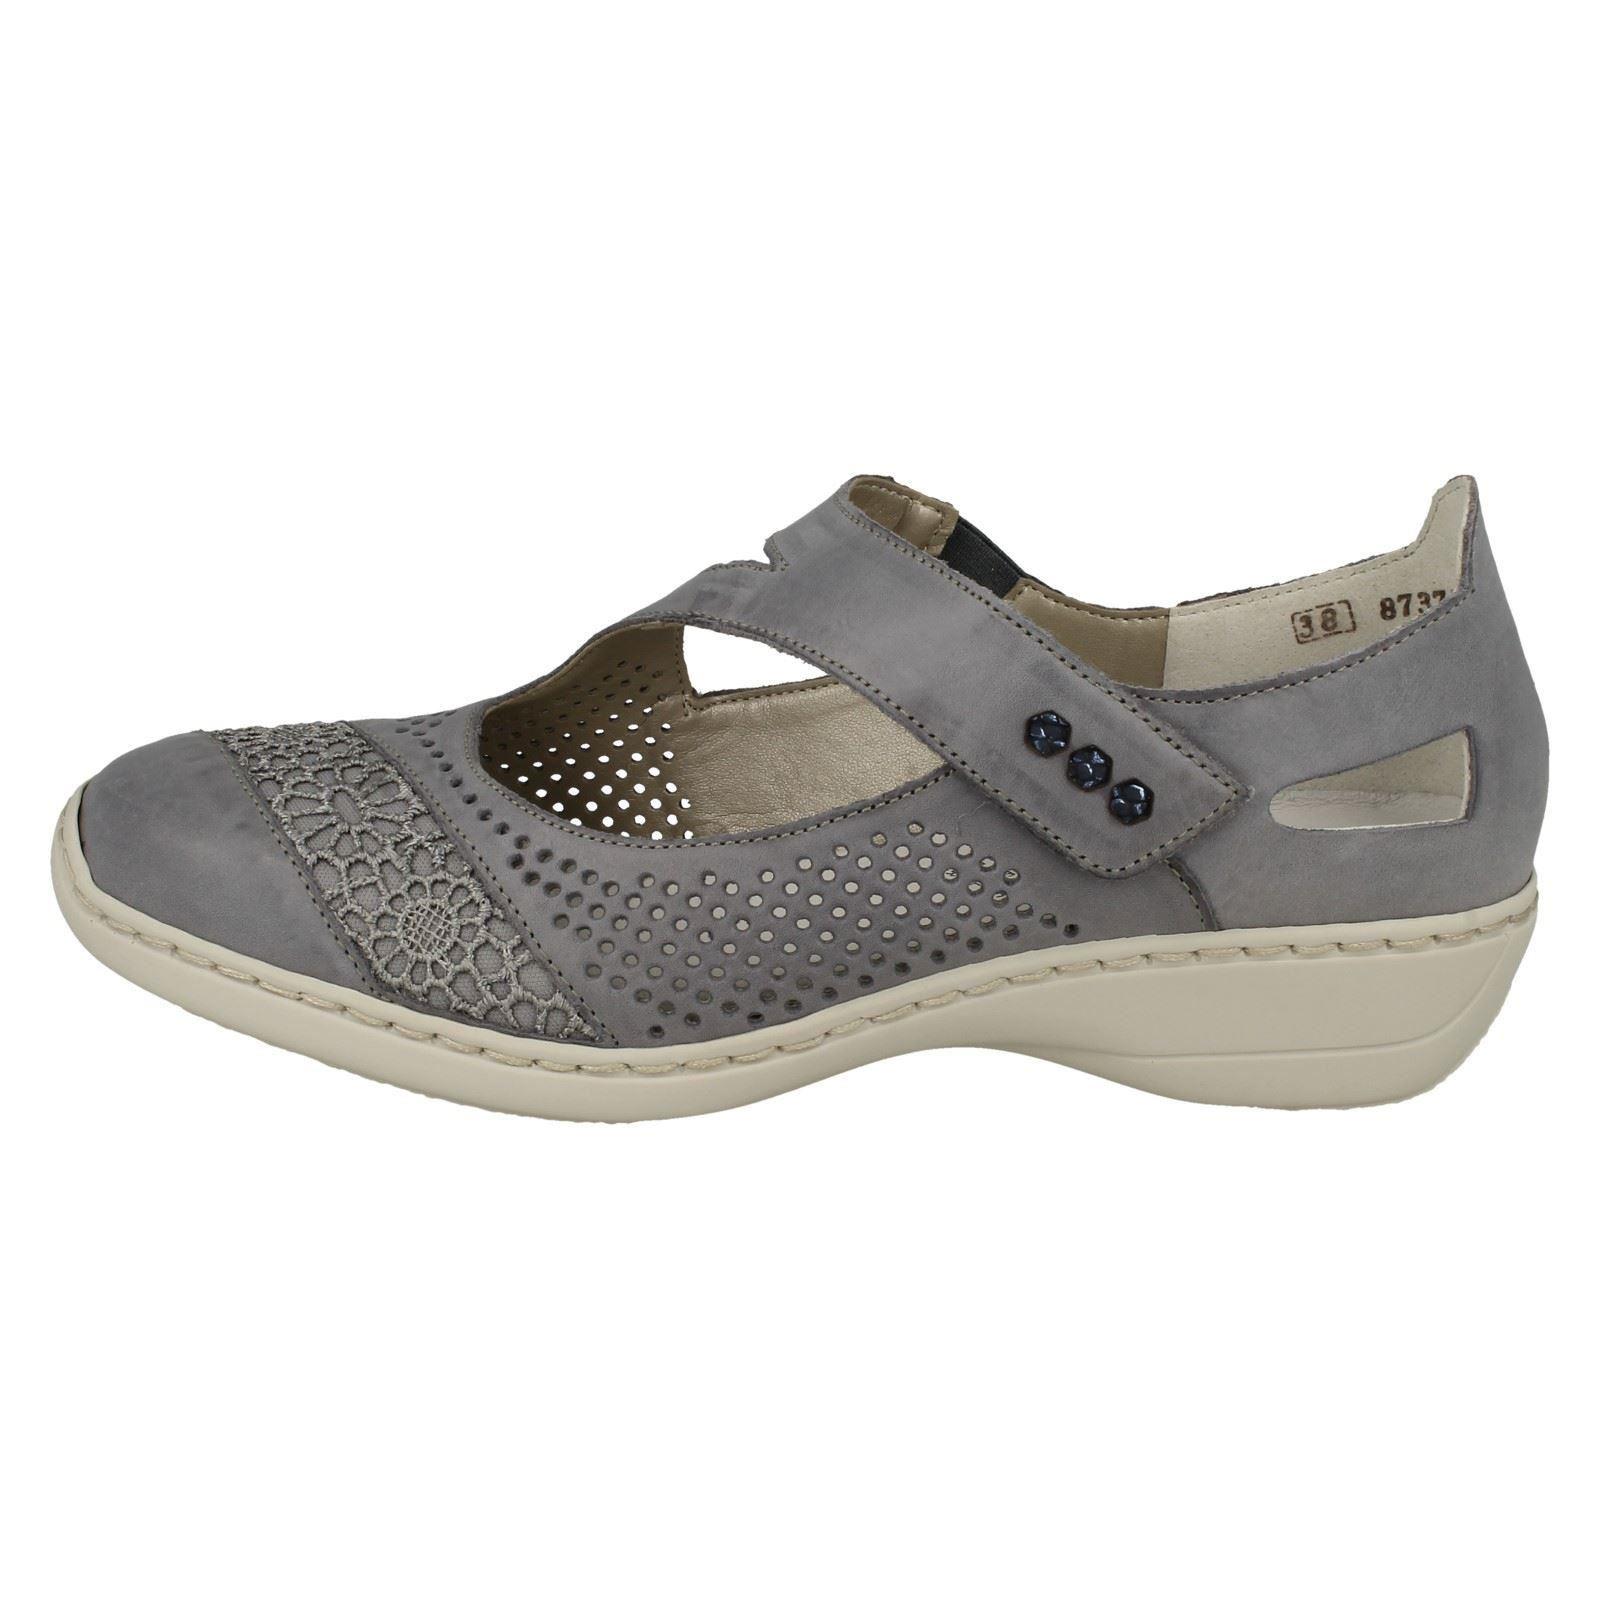 Casual Chaussures en Rieker bleu 41346 Flat HookLoop cuir reBQdxWoC